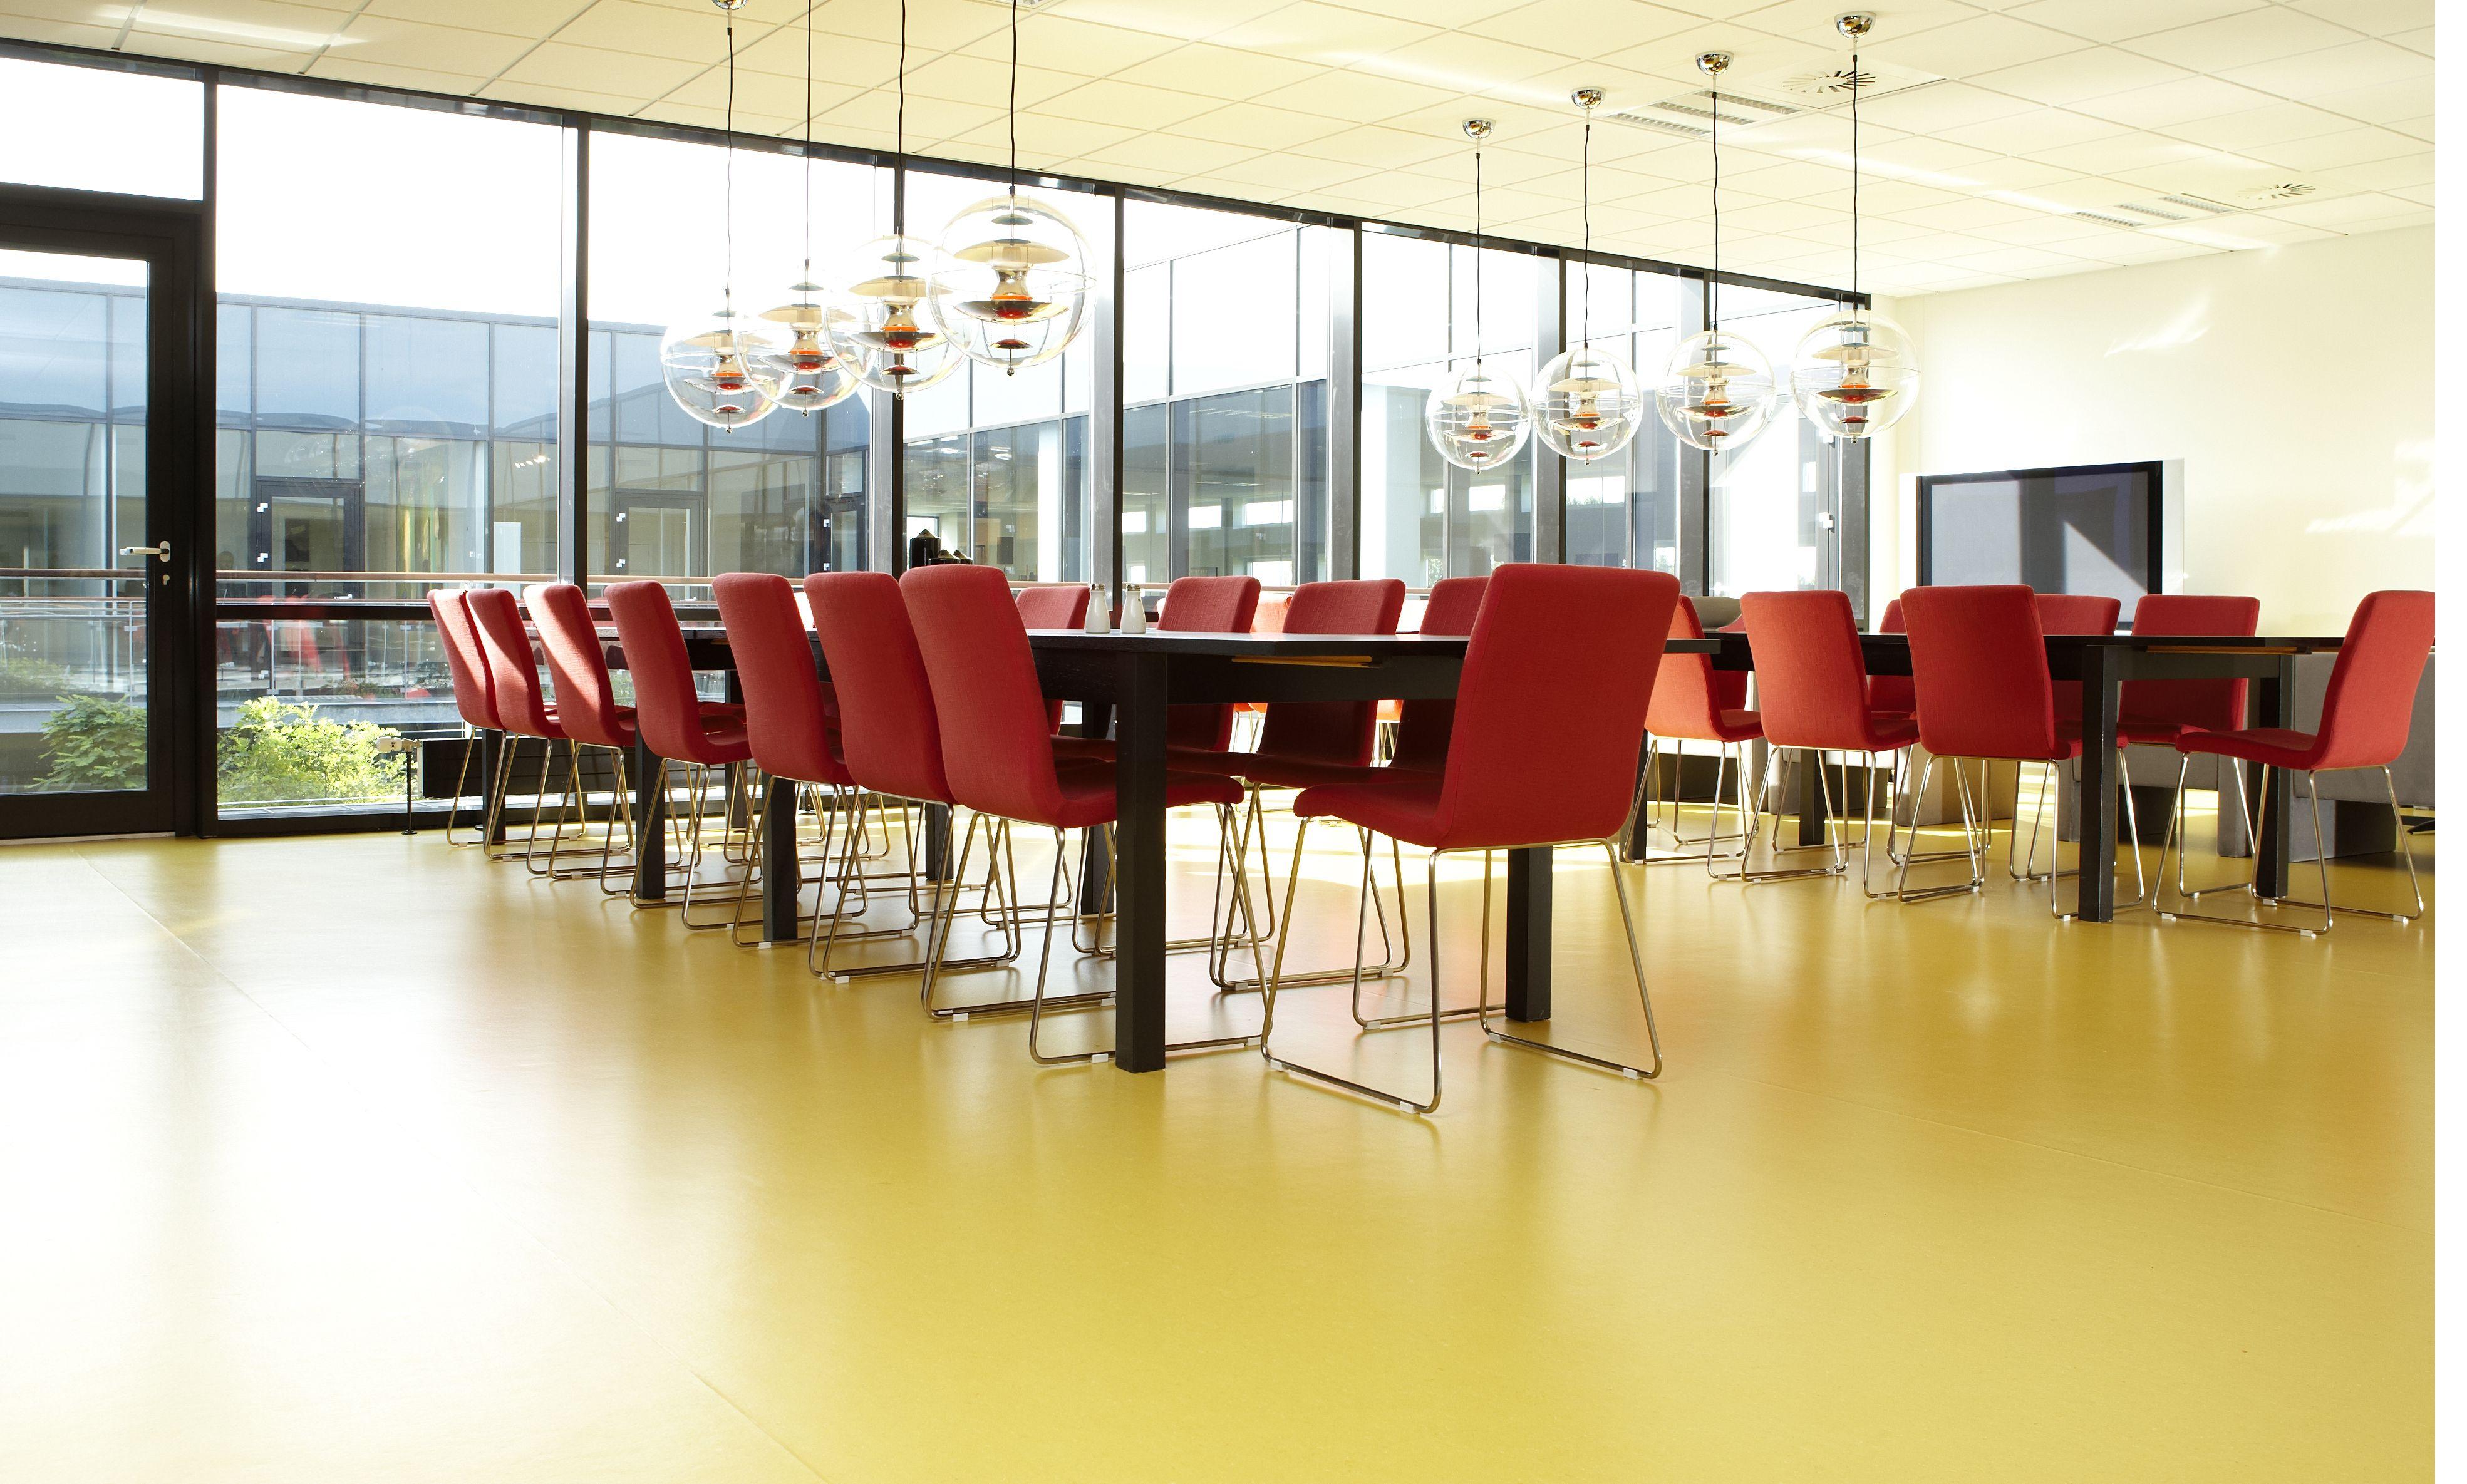 frandsen kontormilj desktop furniture linoleum forbo interior design - Linoleum Restaurant Interior